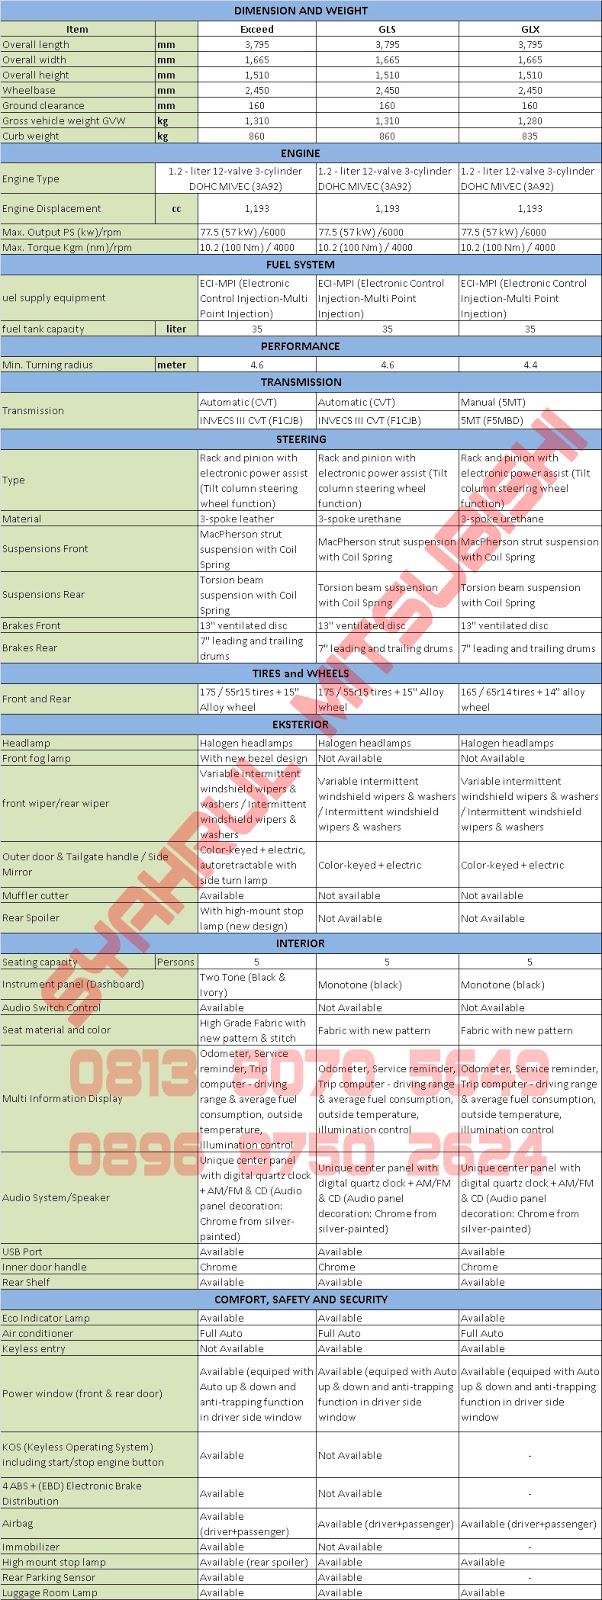 Spesifikasi Lengkap Mirage Facelist 2016